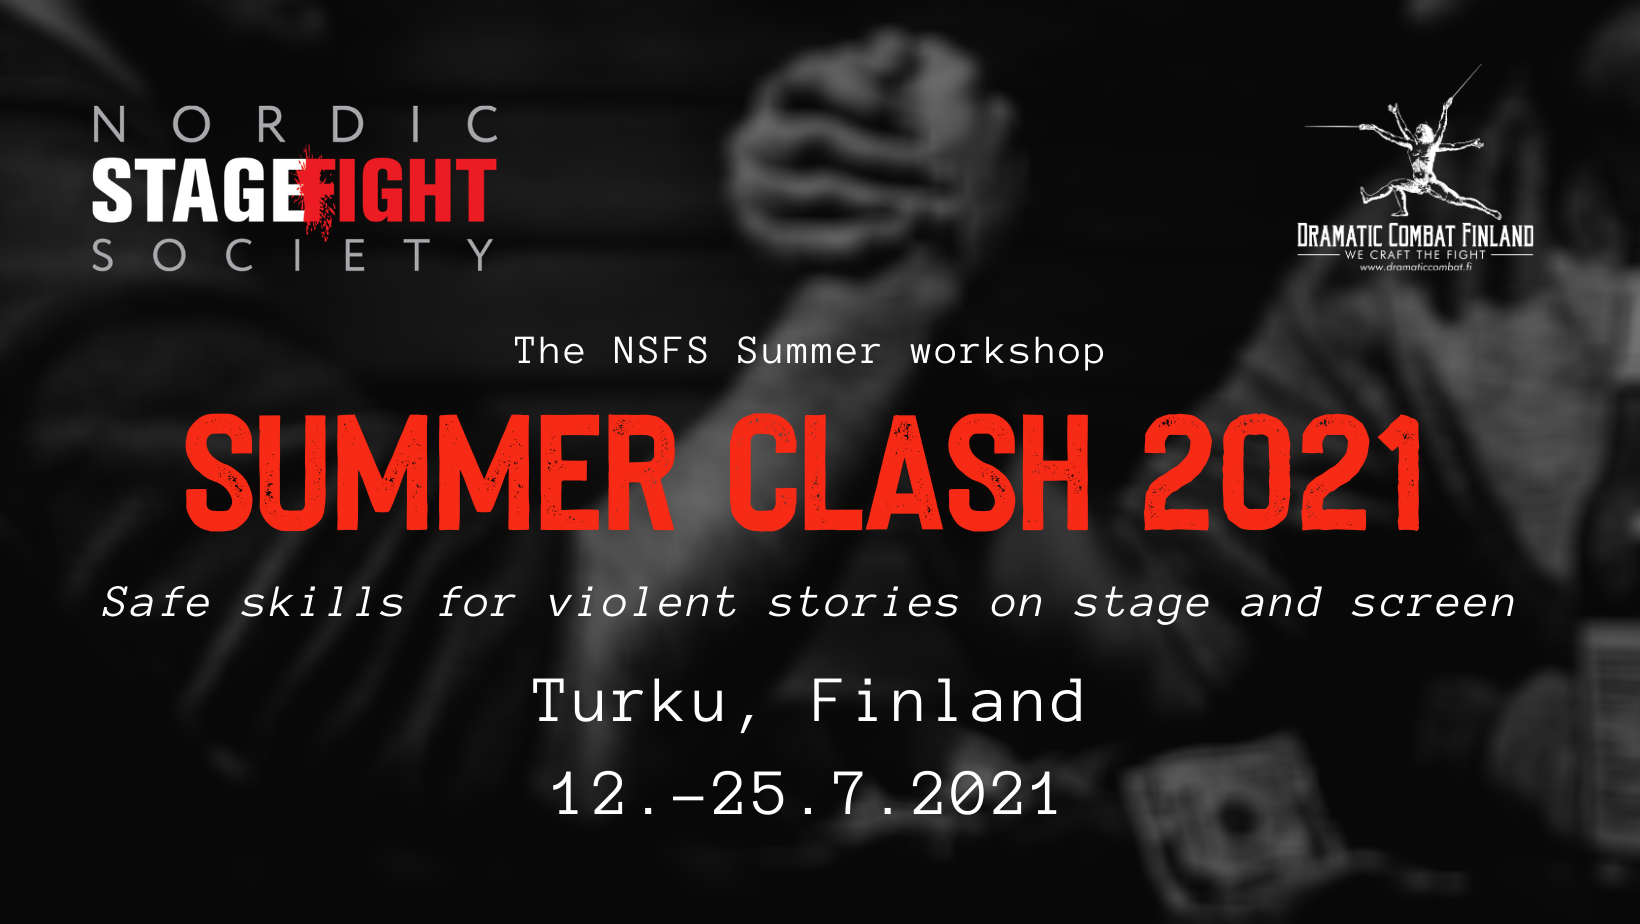 Summer Clash 2021